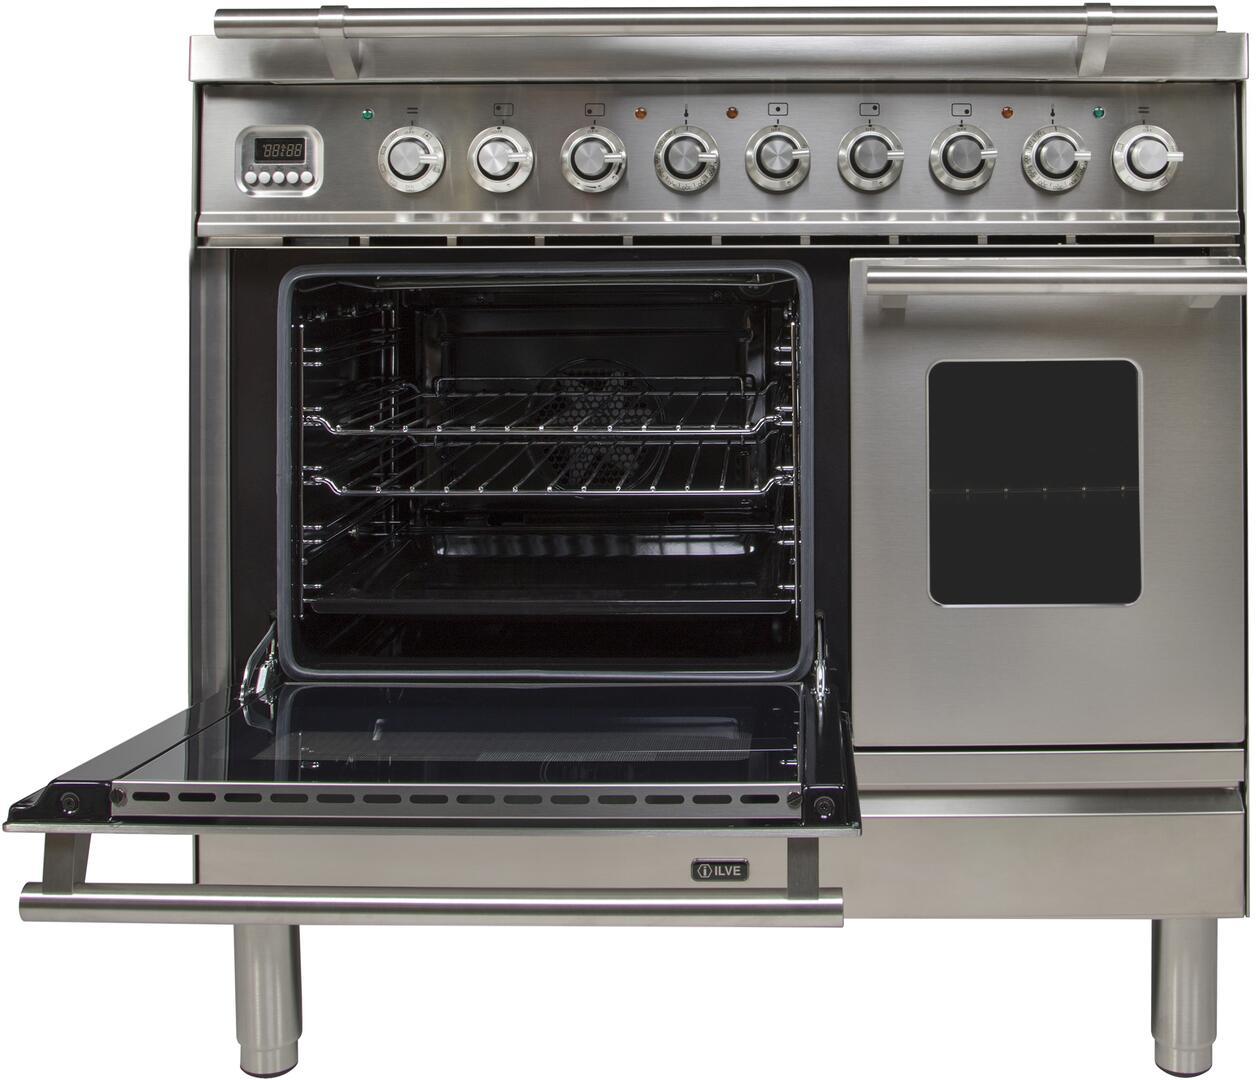 Ilve Professional Plus UPDW90FDMPILP Freestanding Dual Fuel Range Stainless Steel, UPW90FDMPI Main Oven Door Opened